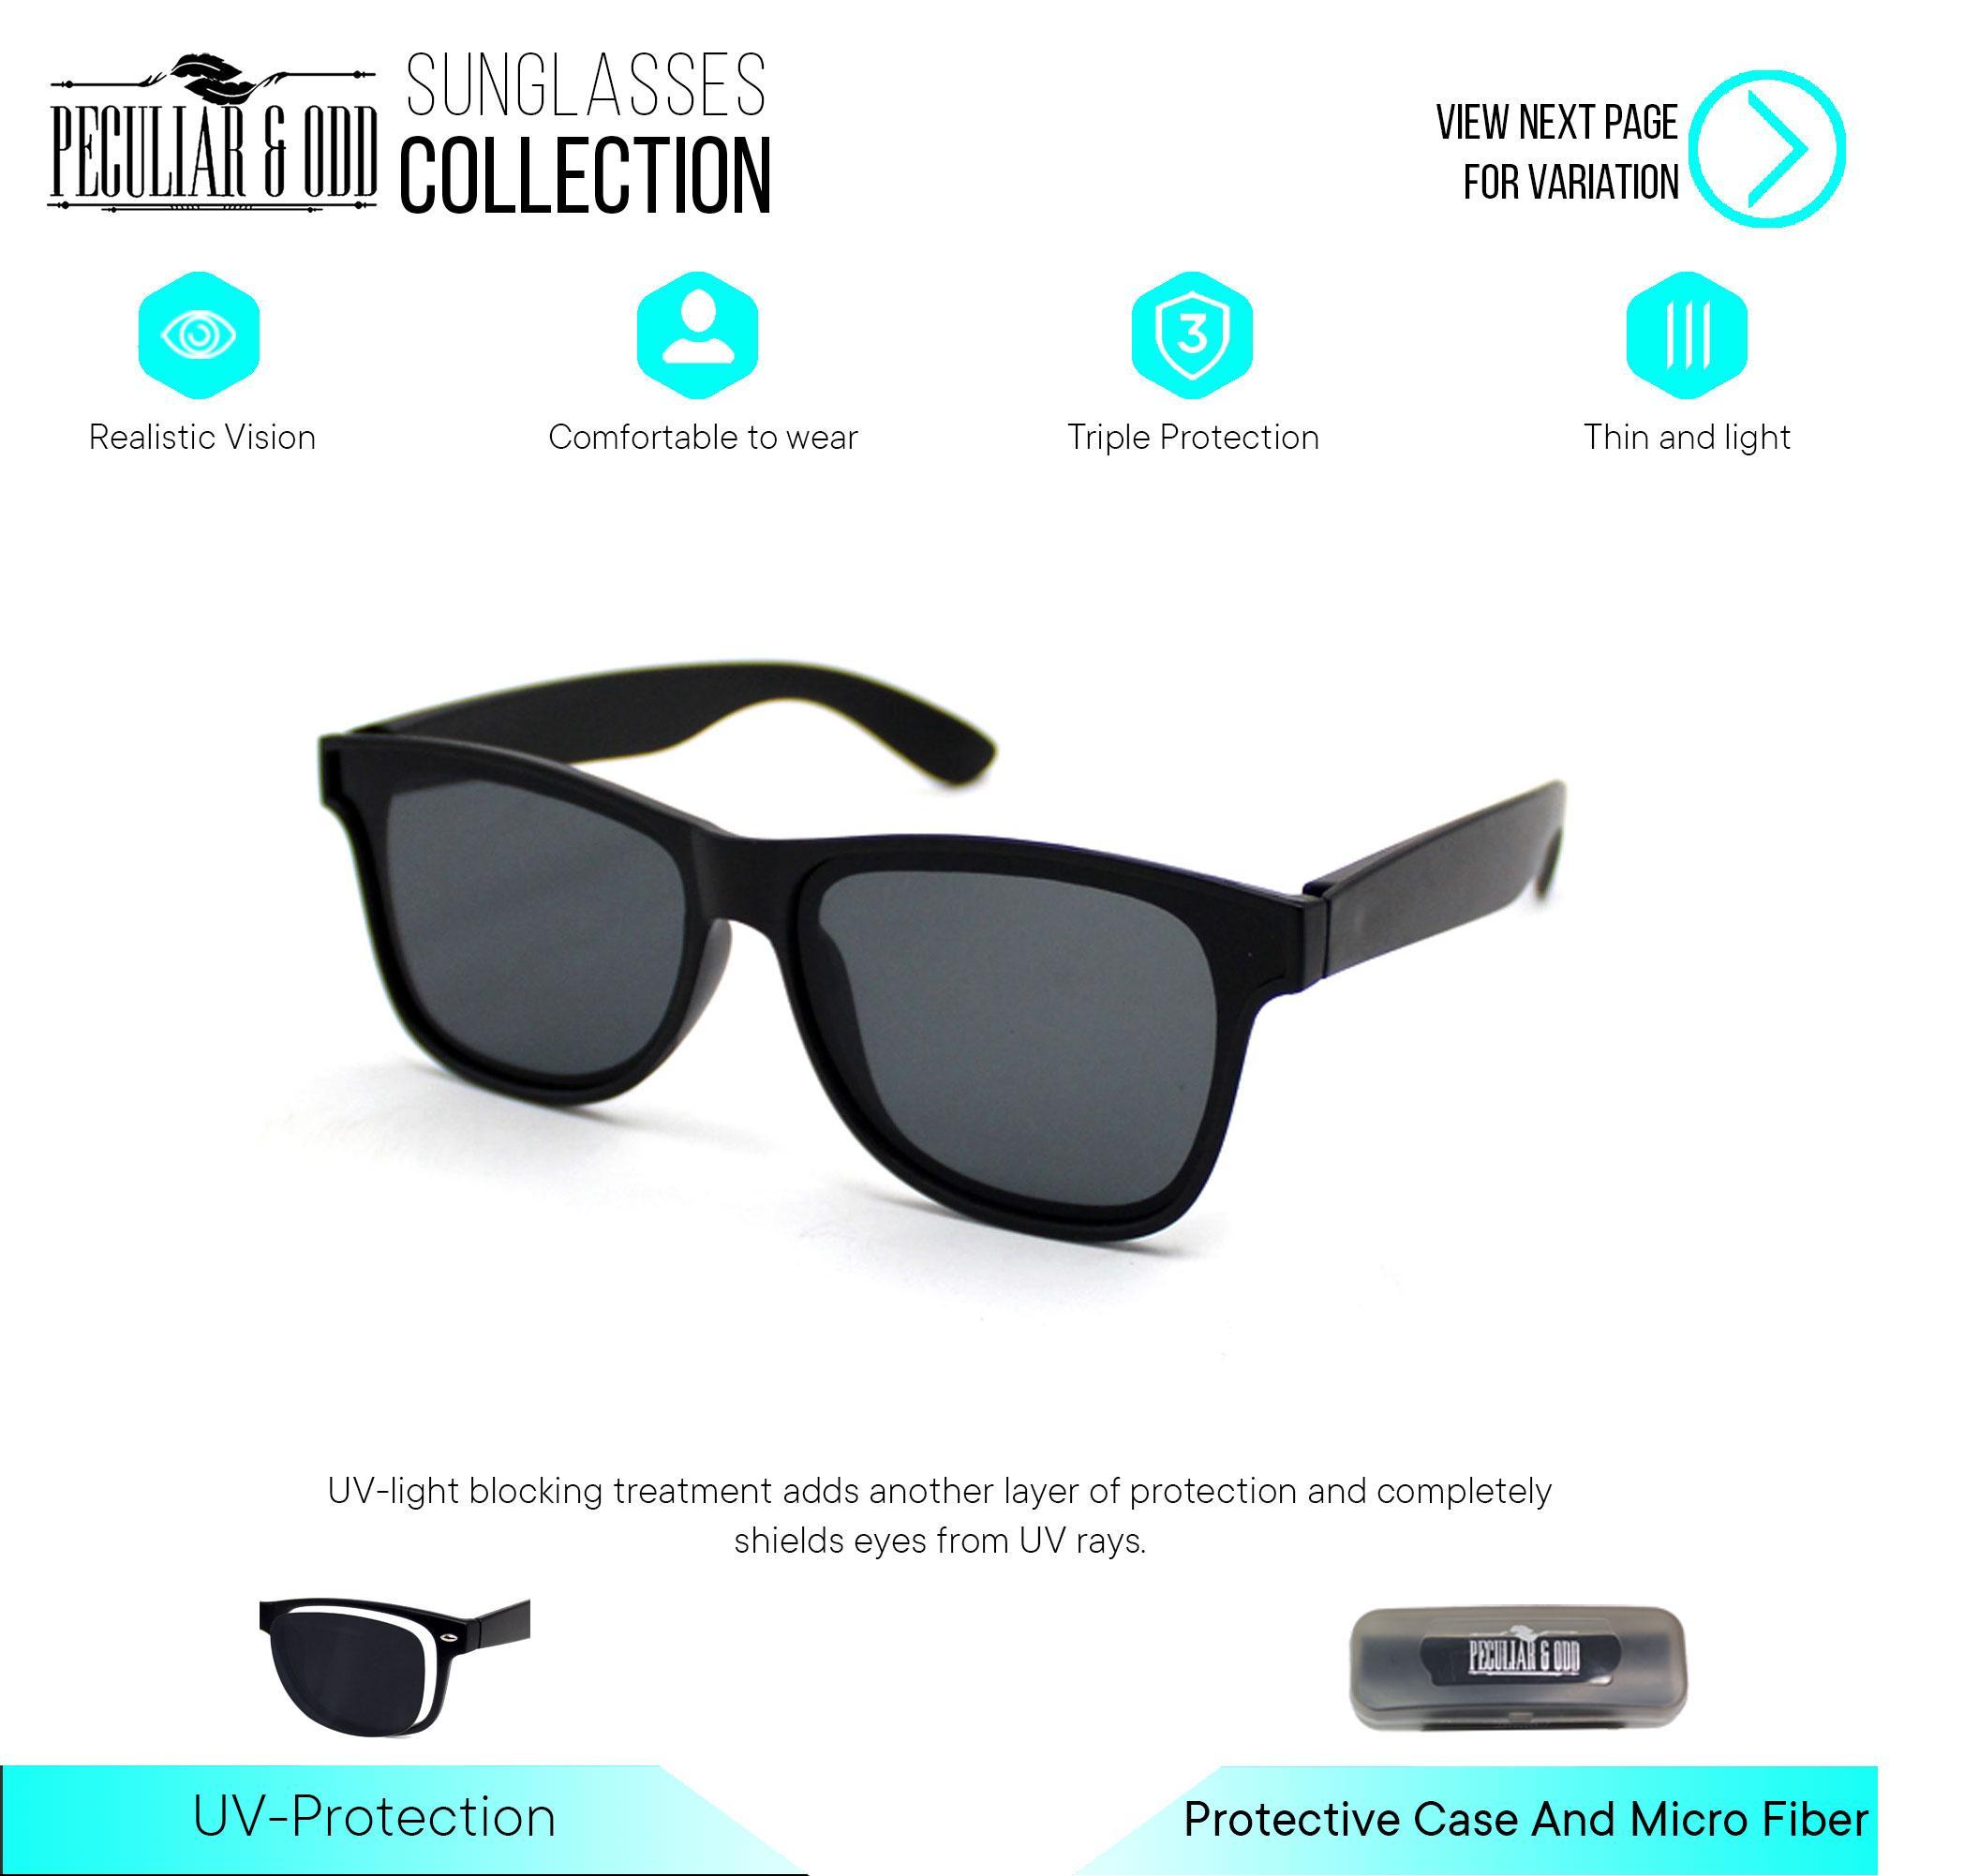 694ab22590d8 Peculiar Wayfarer Classic Sunglass 739 Bblack in Black Frame and Flash  Lenses